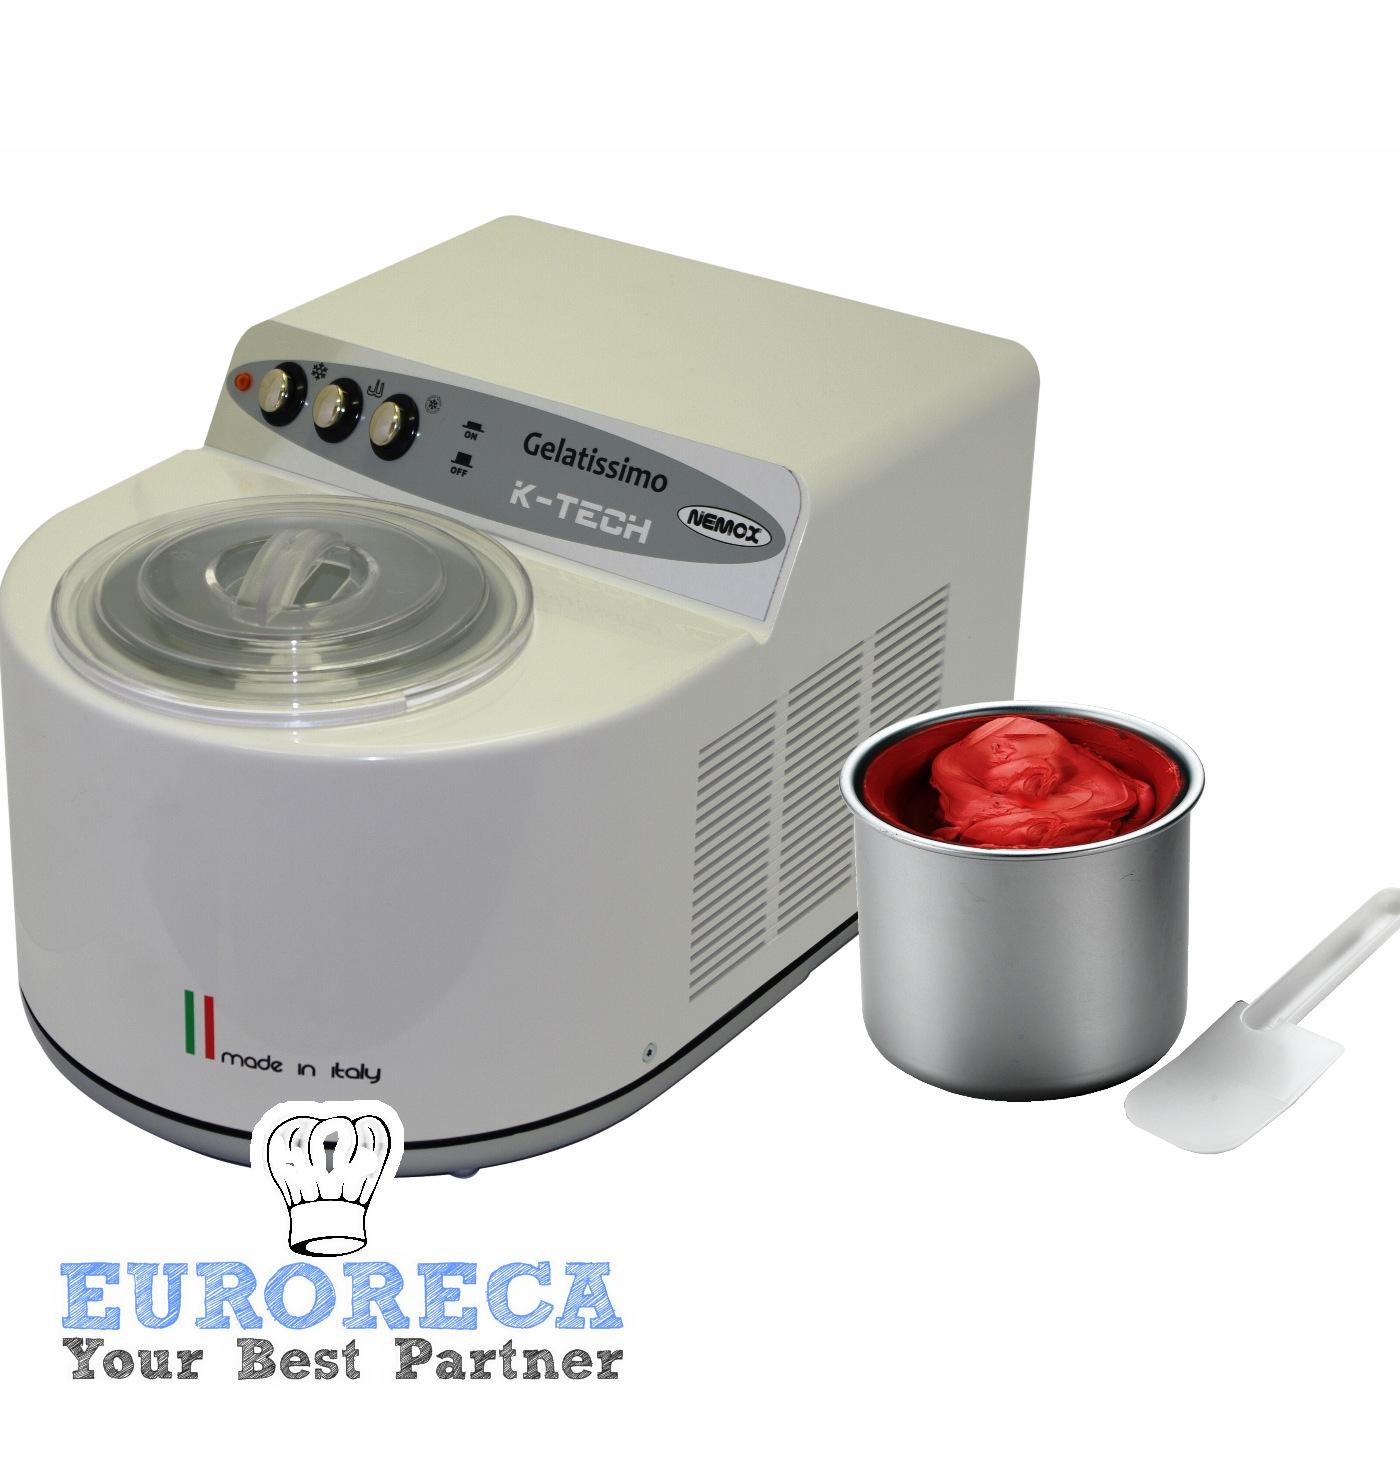 Machine à glace Gelatissimo Ktech Bianca Nemox